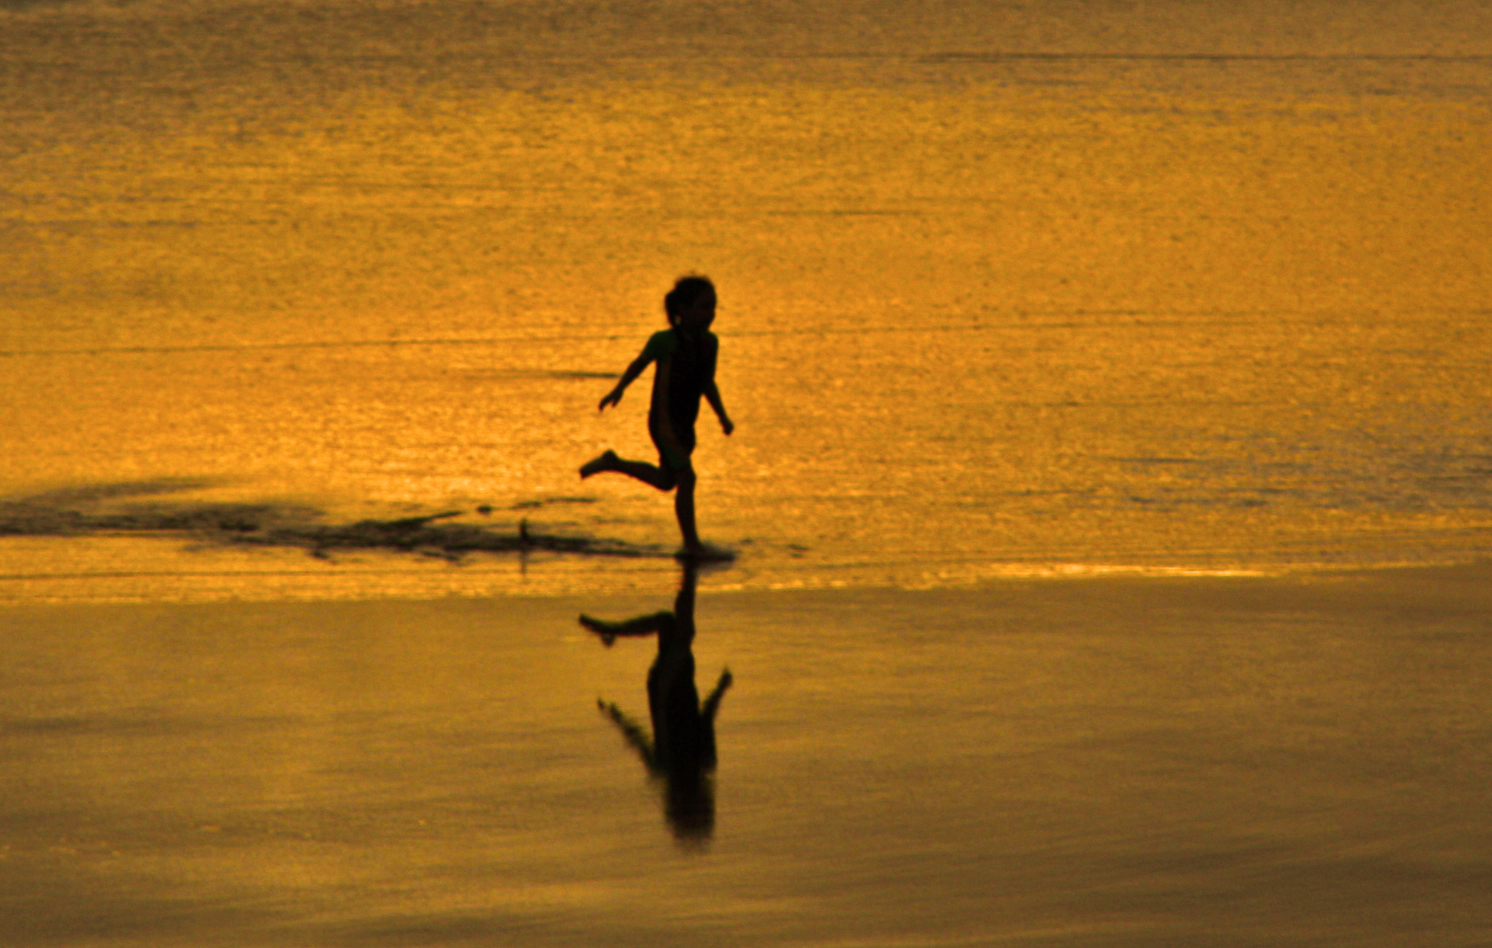 Strandlauf bei Sonnenuntergang